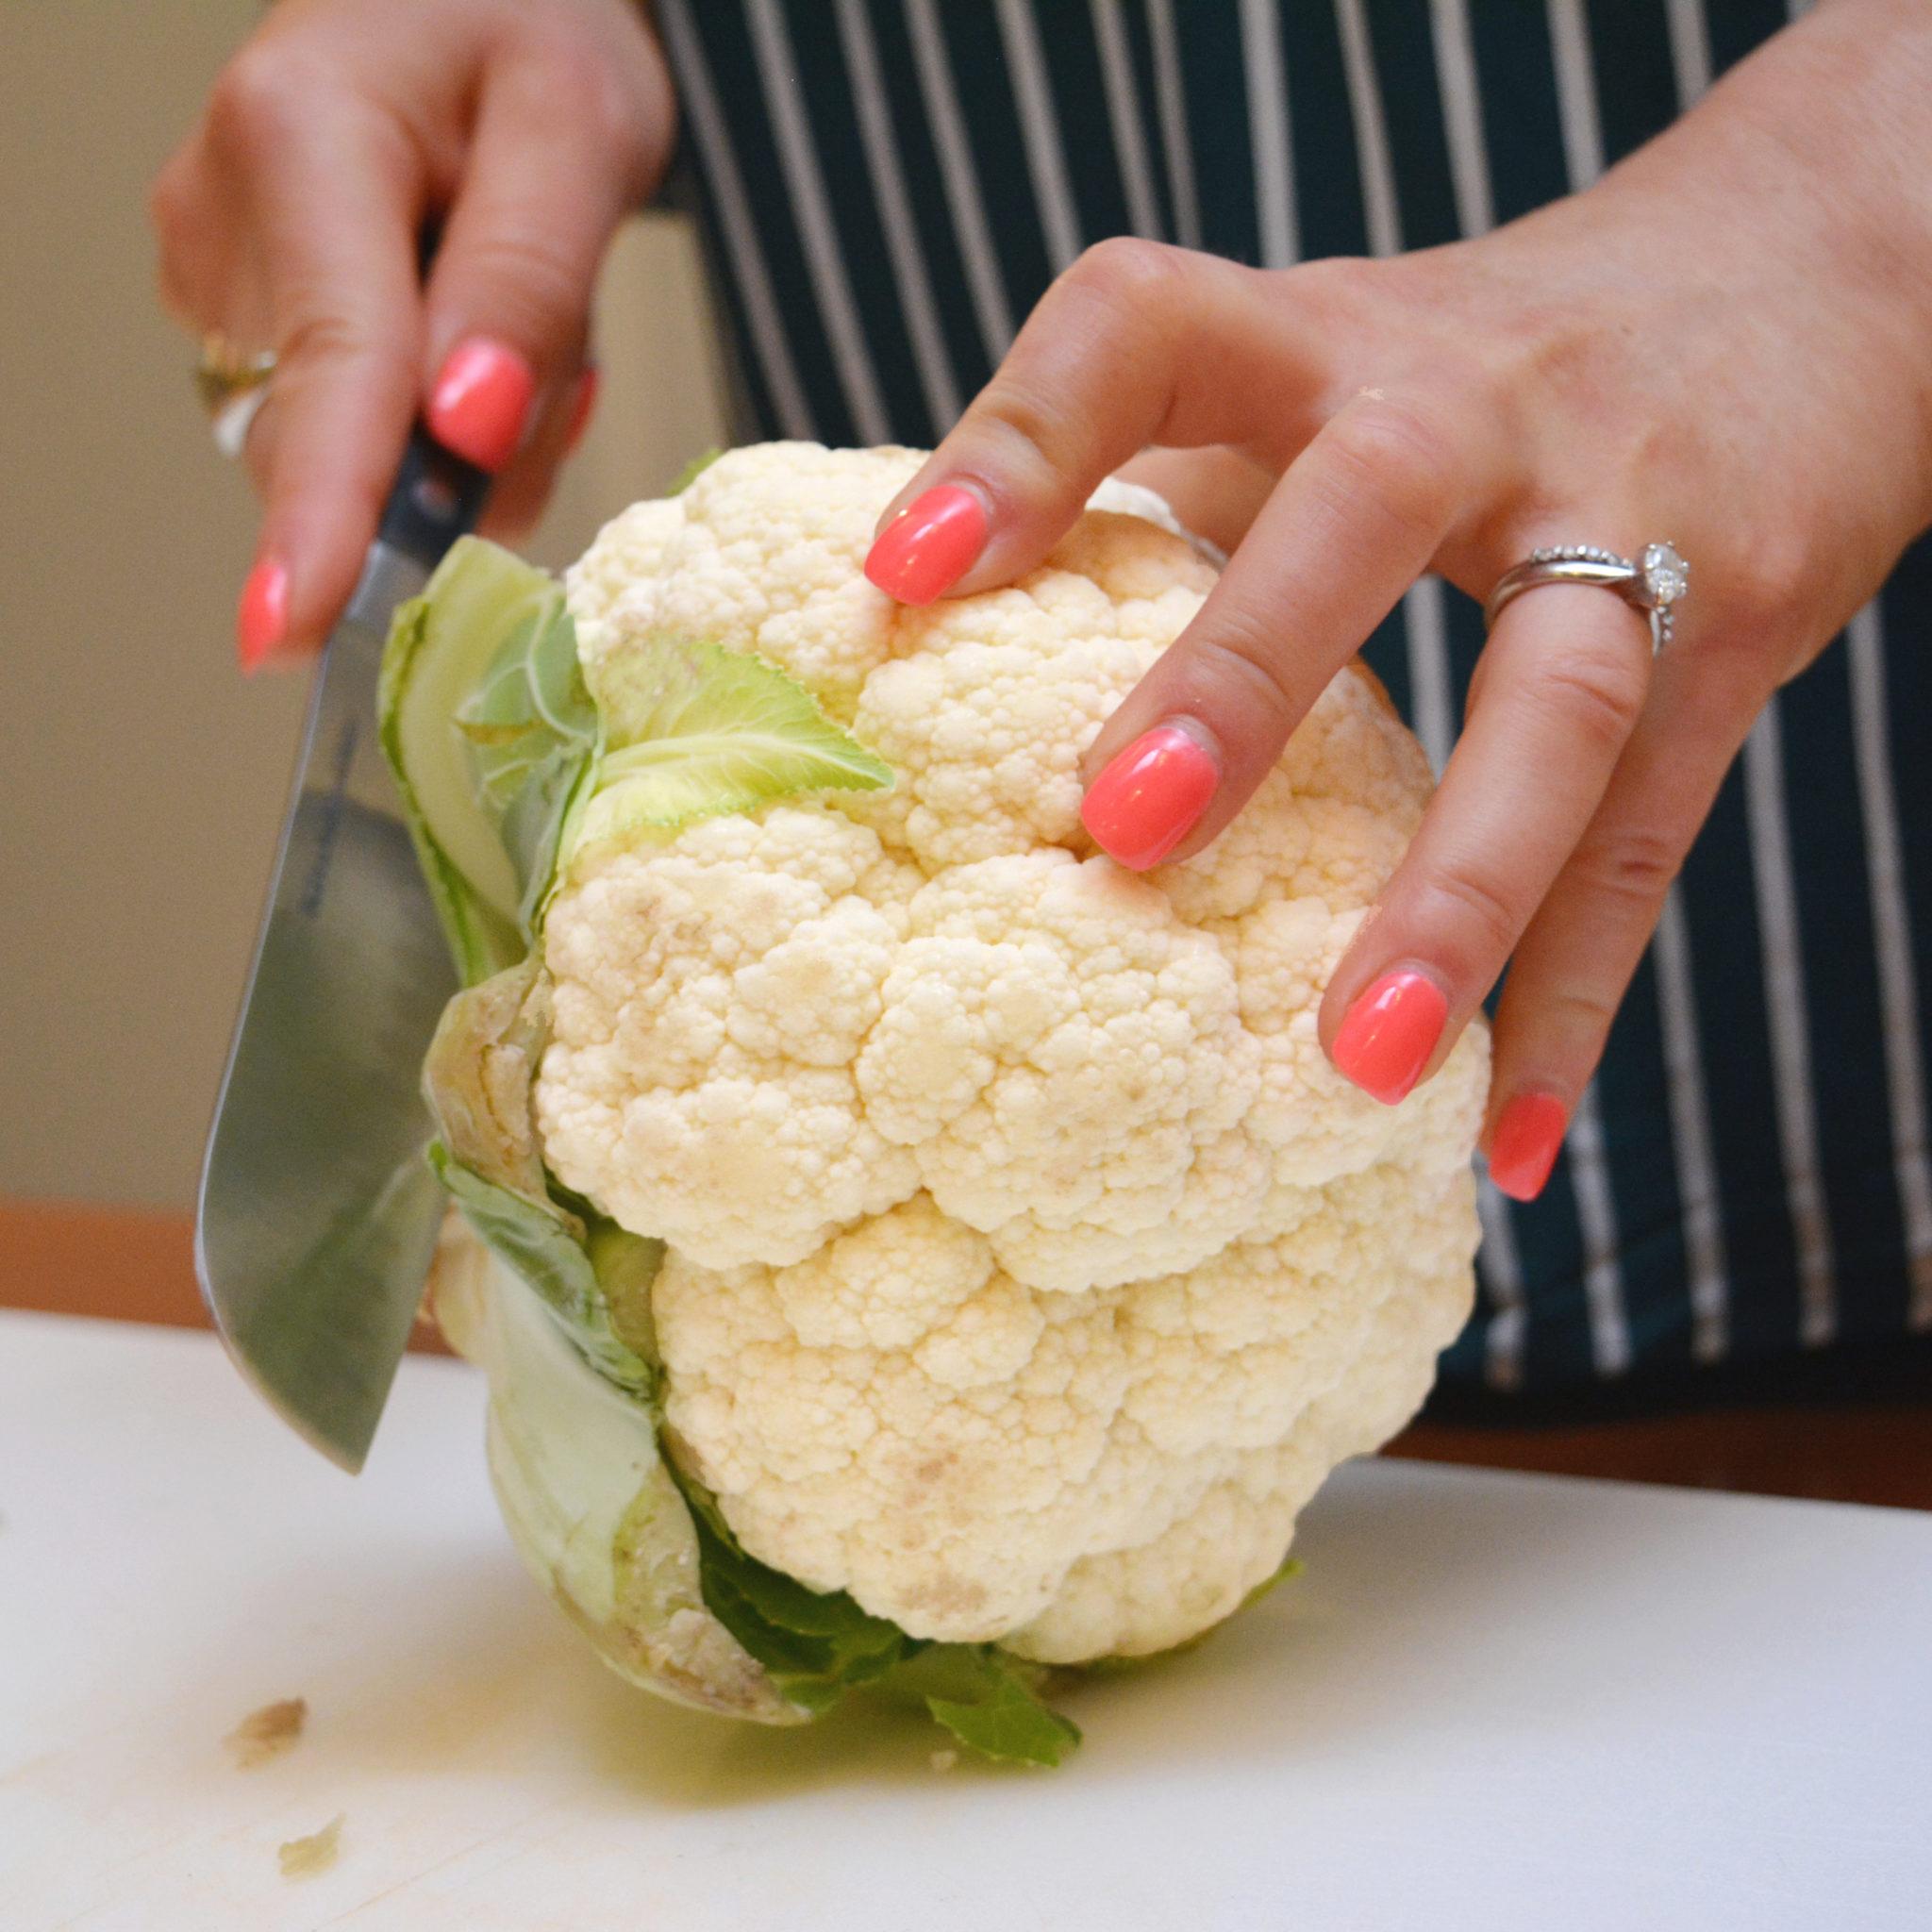 Preparing a head of cauliflower